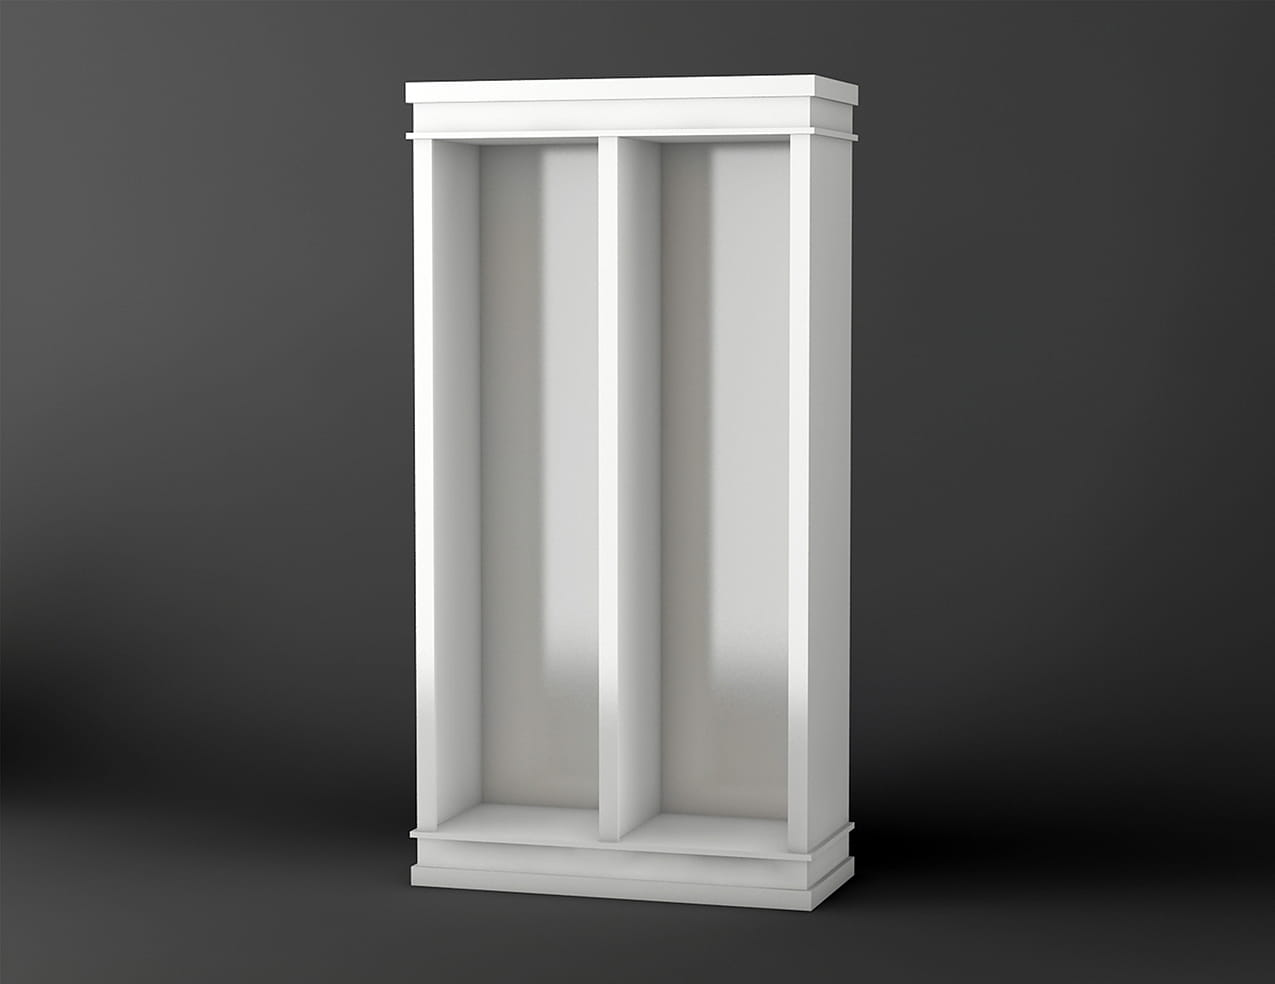 Hoogglans Wit Kast : Tv meubel easy van cm breed in de kleur hoogglans wit